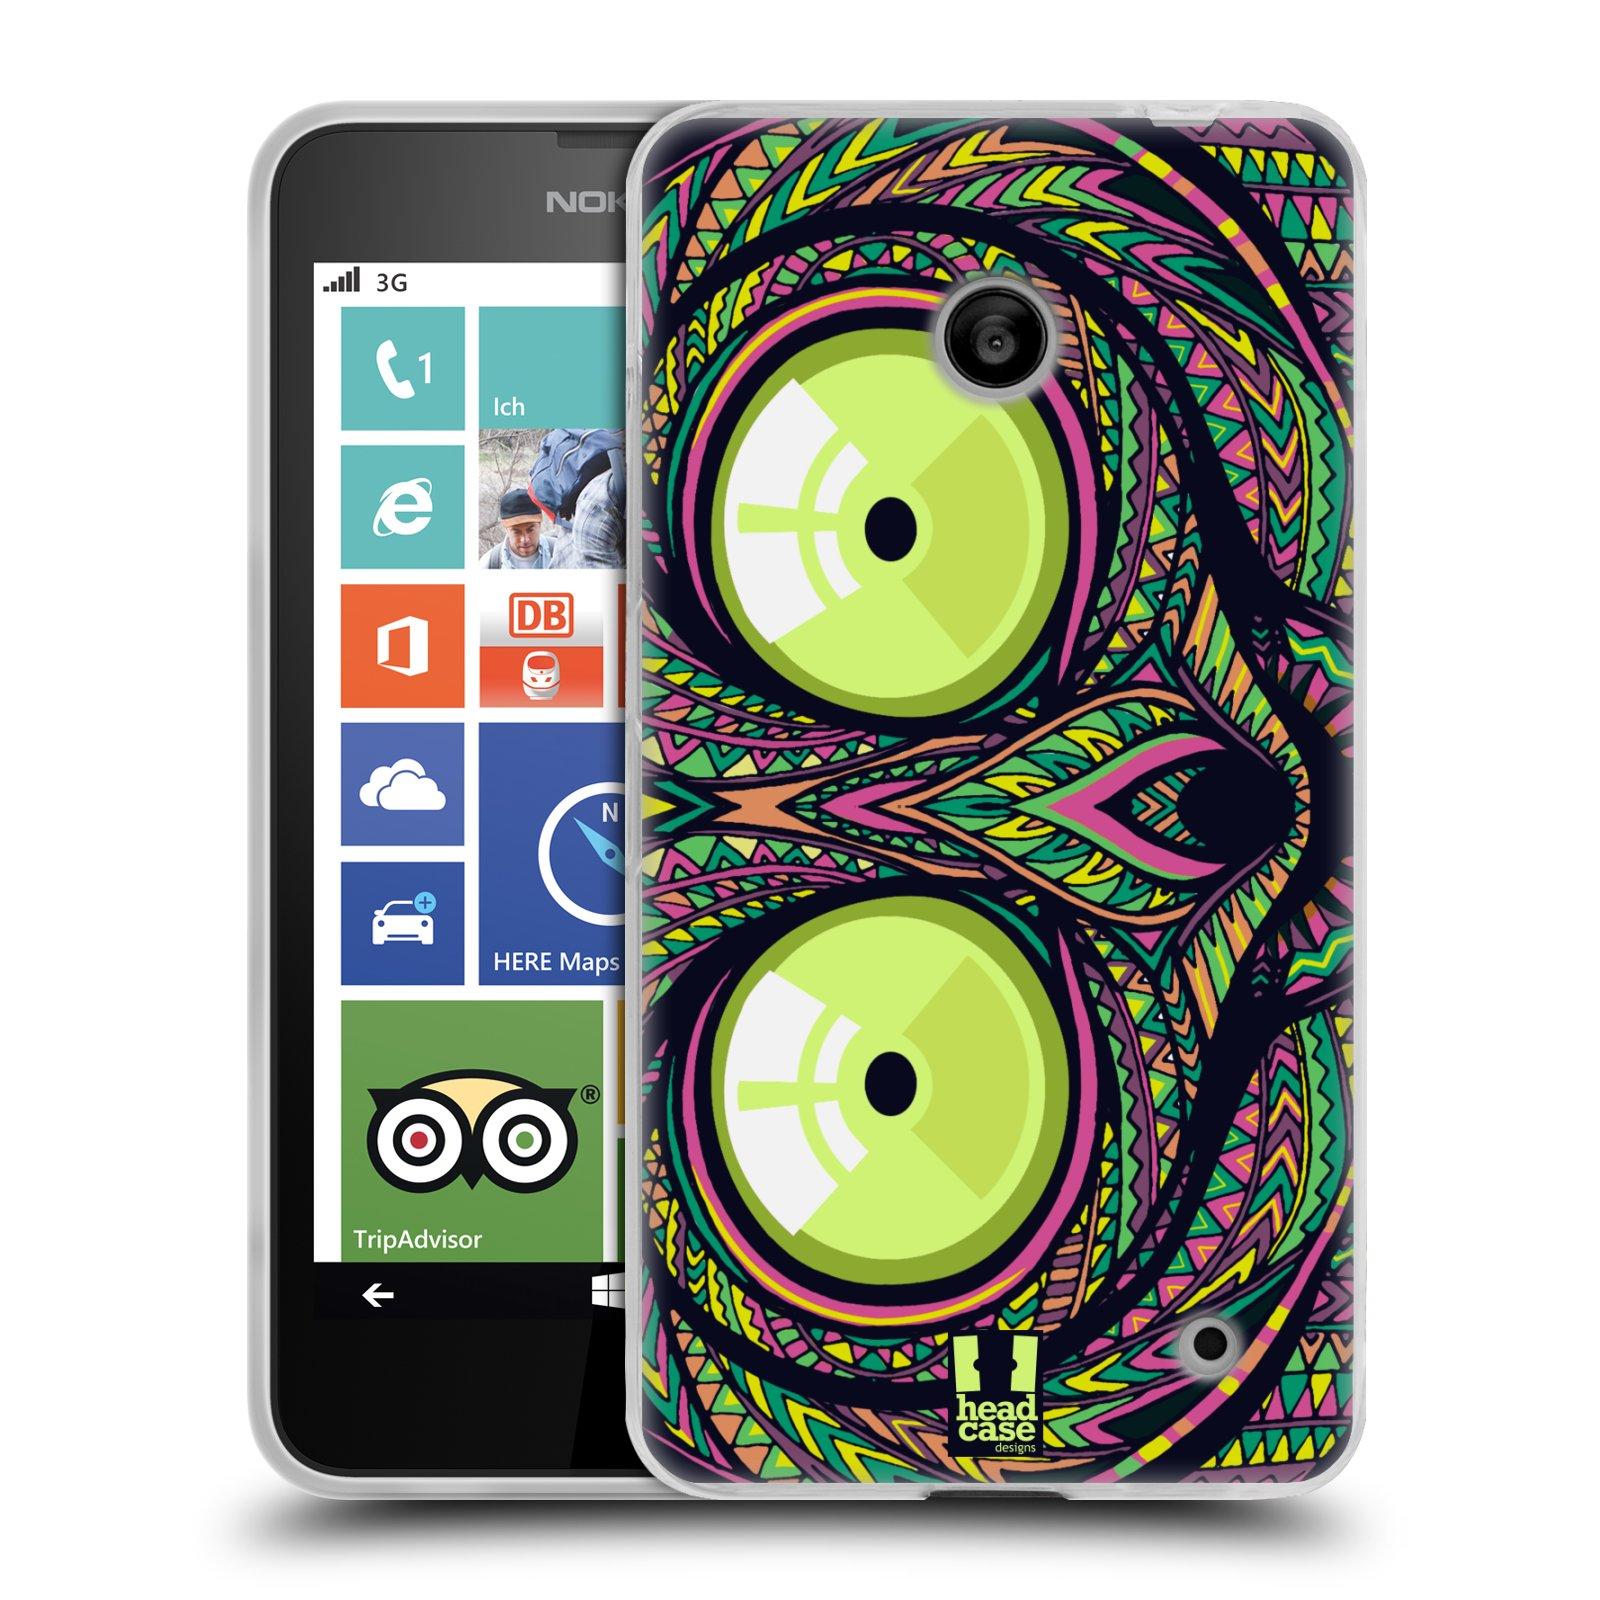 Silikonové pouzdro na mobil Nokia Lumia 630 HEAD CASE AZTEC NÁRTOUN (Silikonový kryt či obal na mobilní telefon Nokia Lumia 630 a Nokia Lumia 630 Dual SIM)